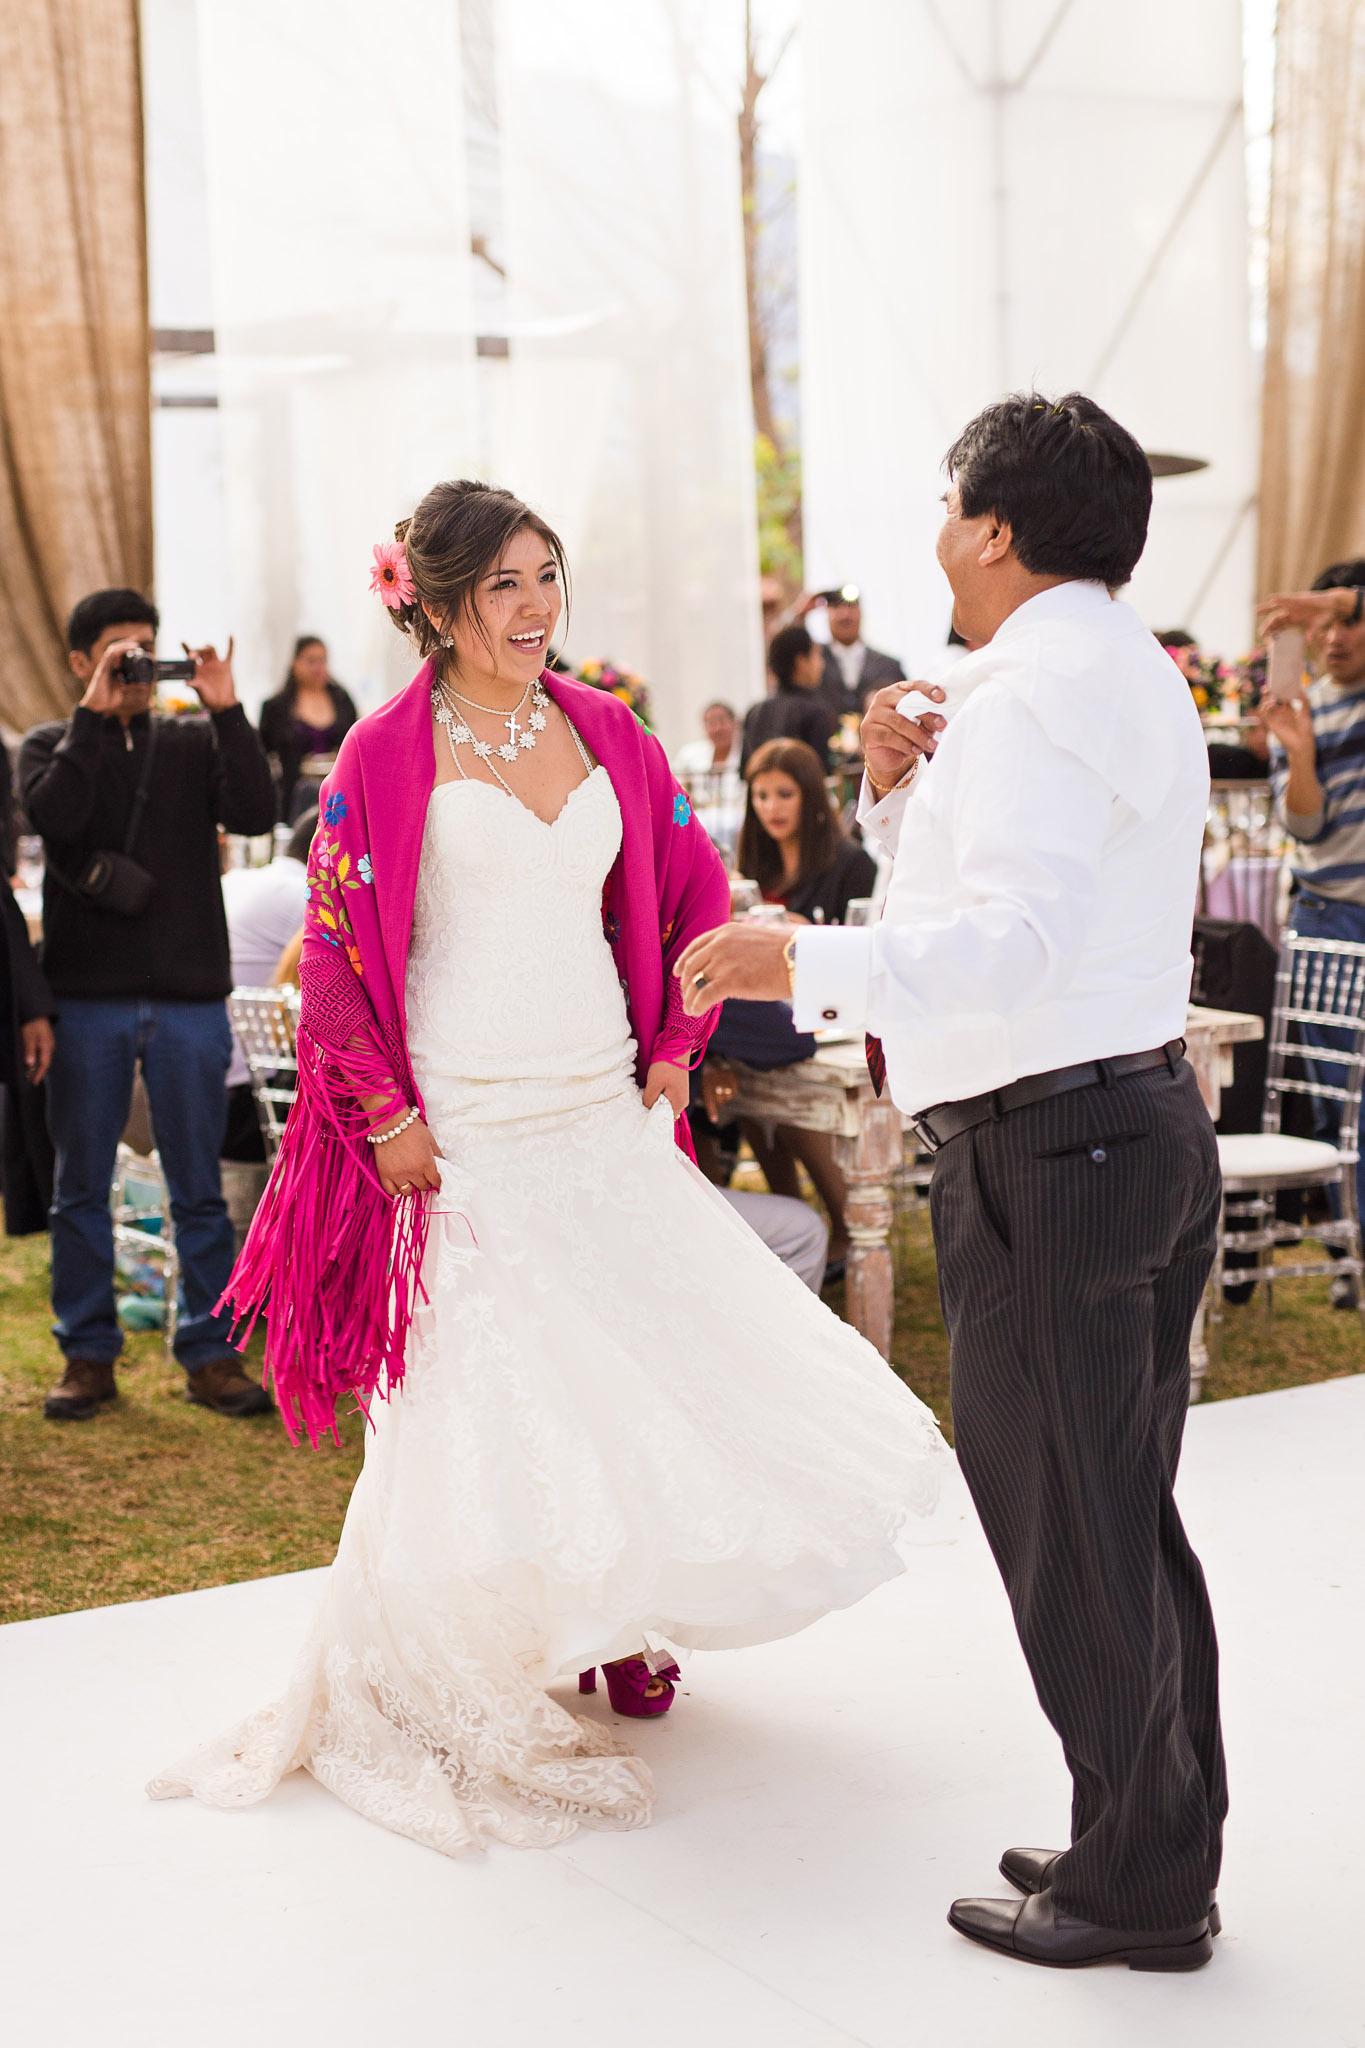 Wedding-Travellers-Destination-Wedding-Peru-Cusco-Hacienda-Sarapampa-Sacred-Valley-queca-traditional-dance